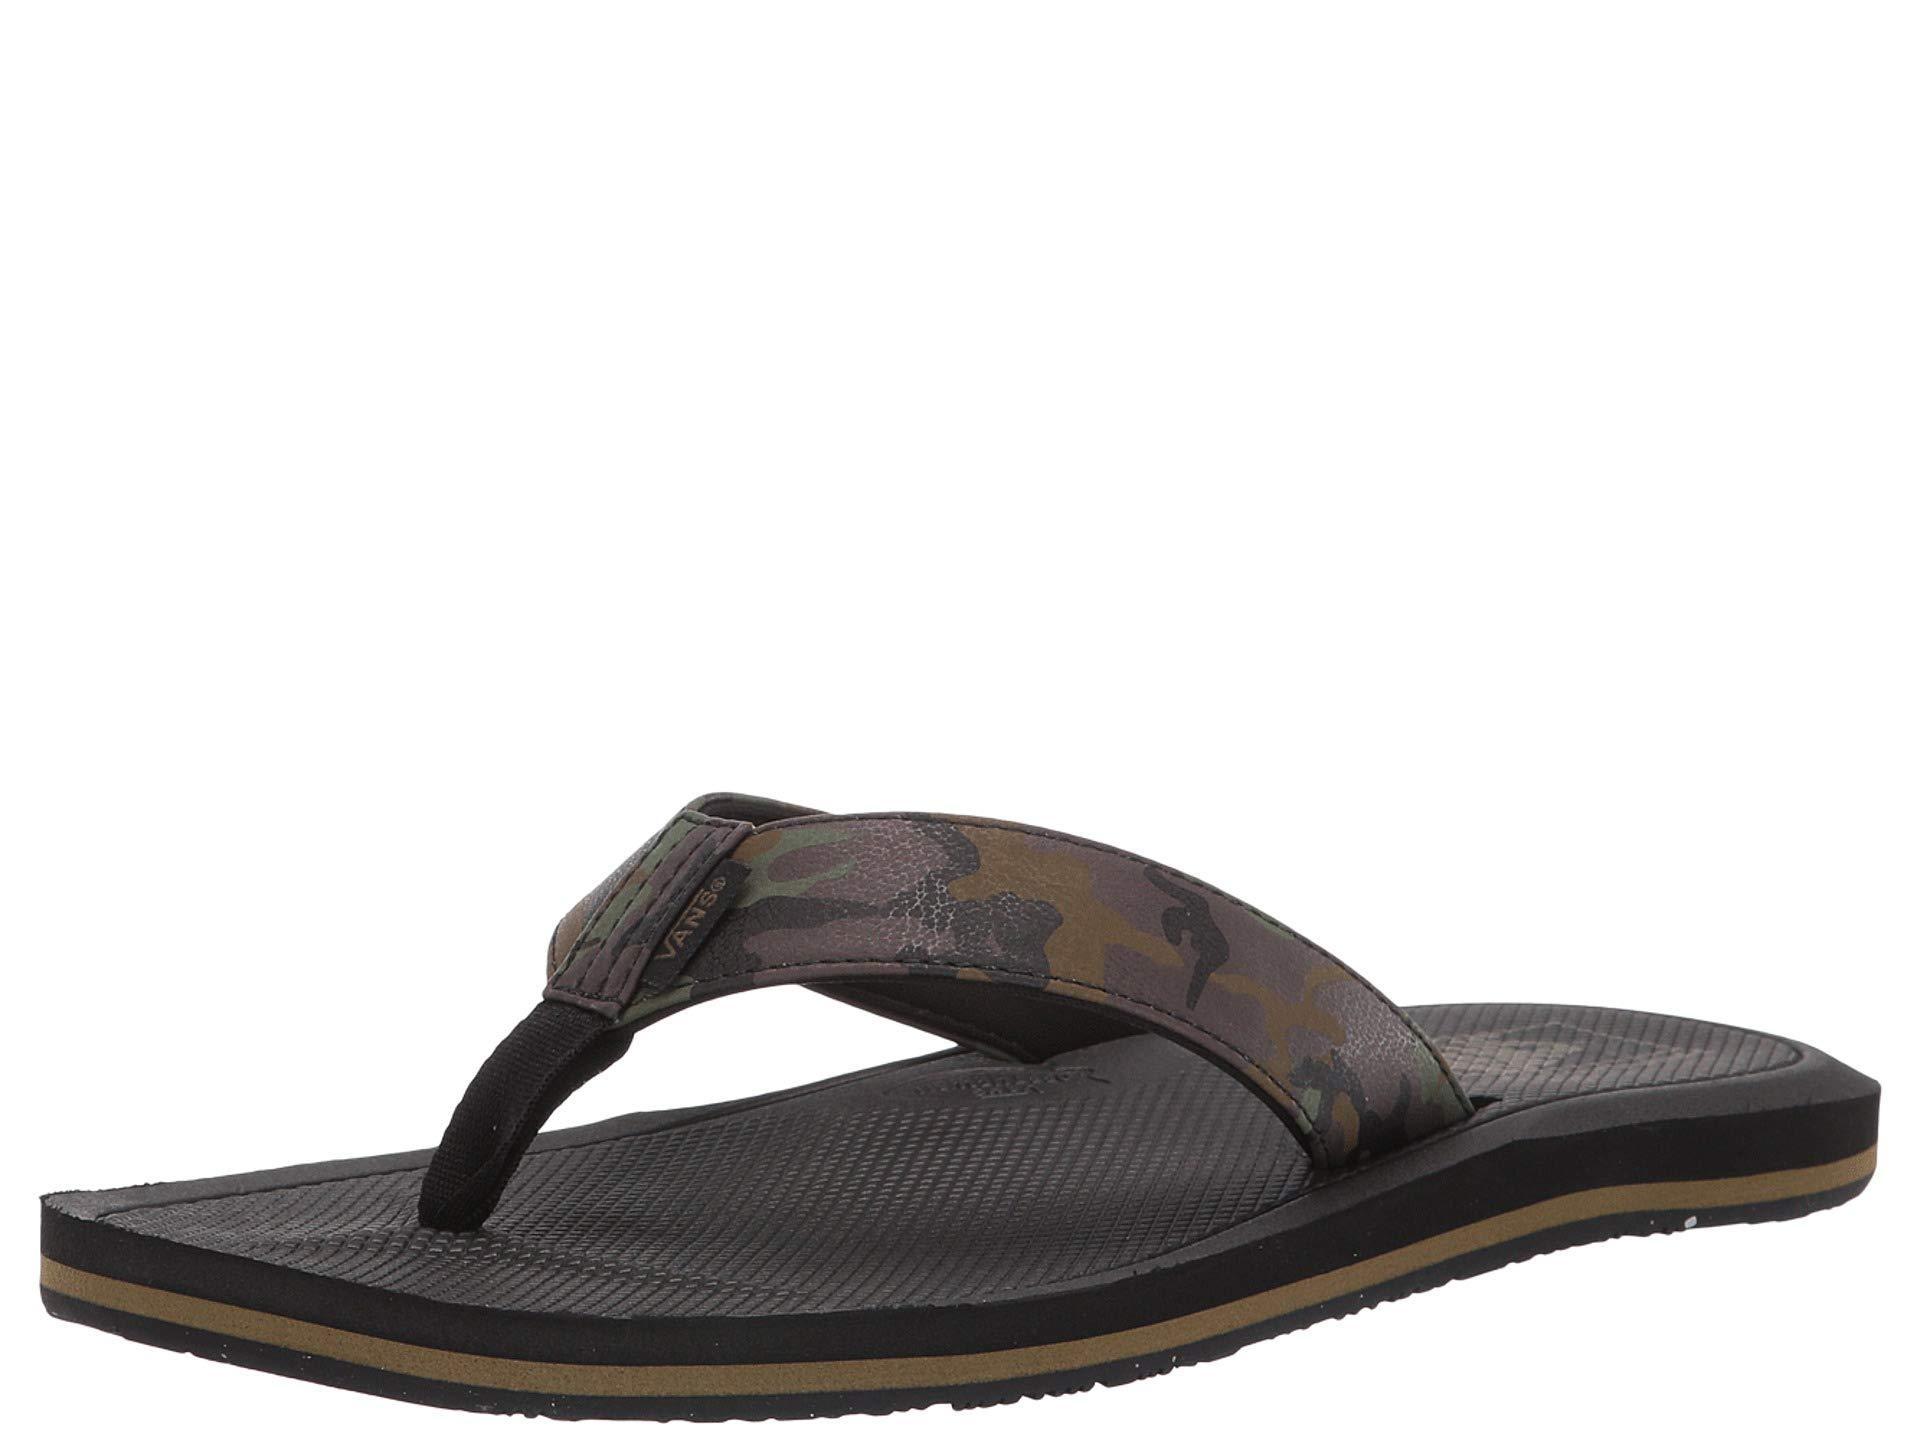 bd25cc09a89b Vans - Nexpa Synthetic (black black pewter) Men s Sandals for Men -. View  fullscreen